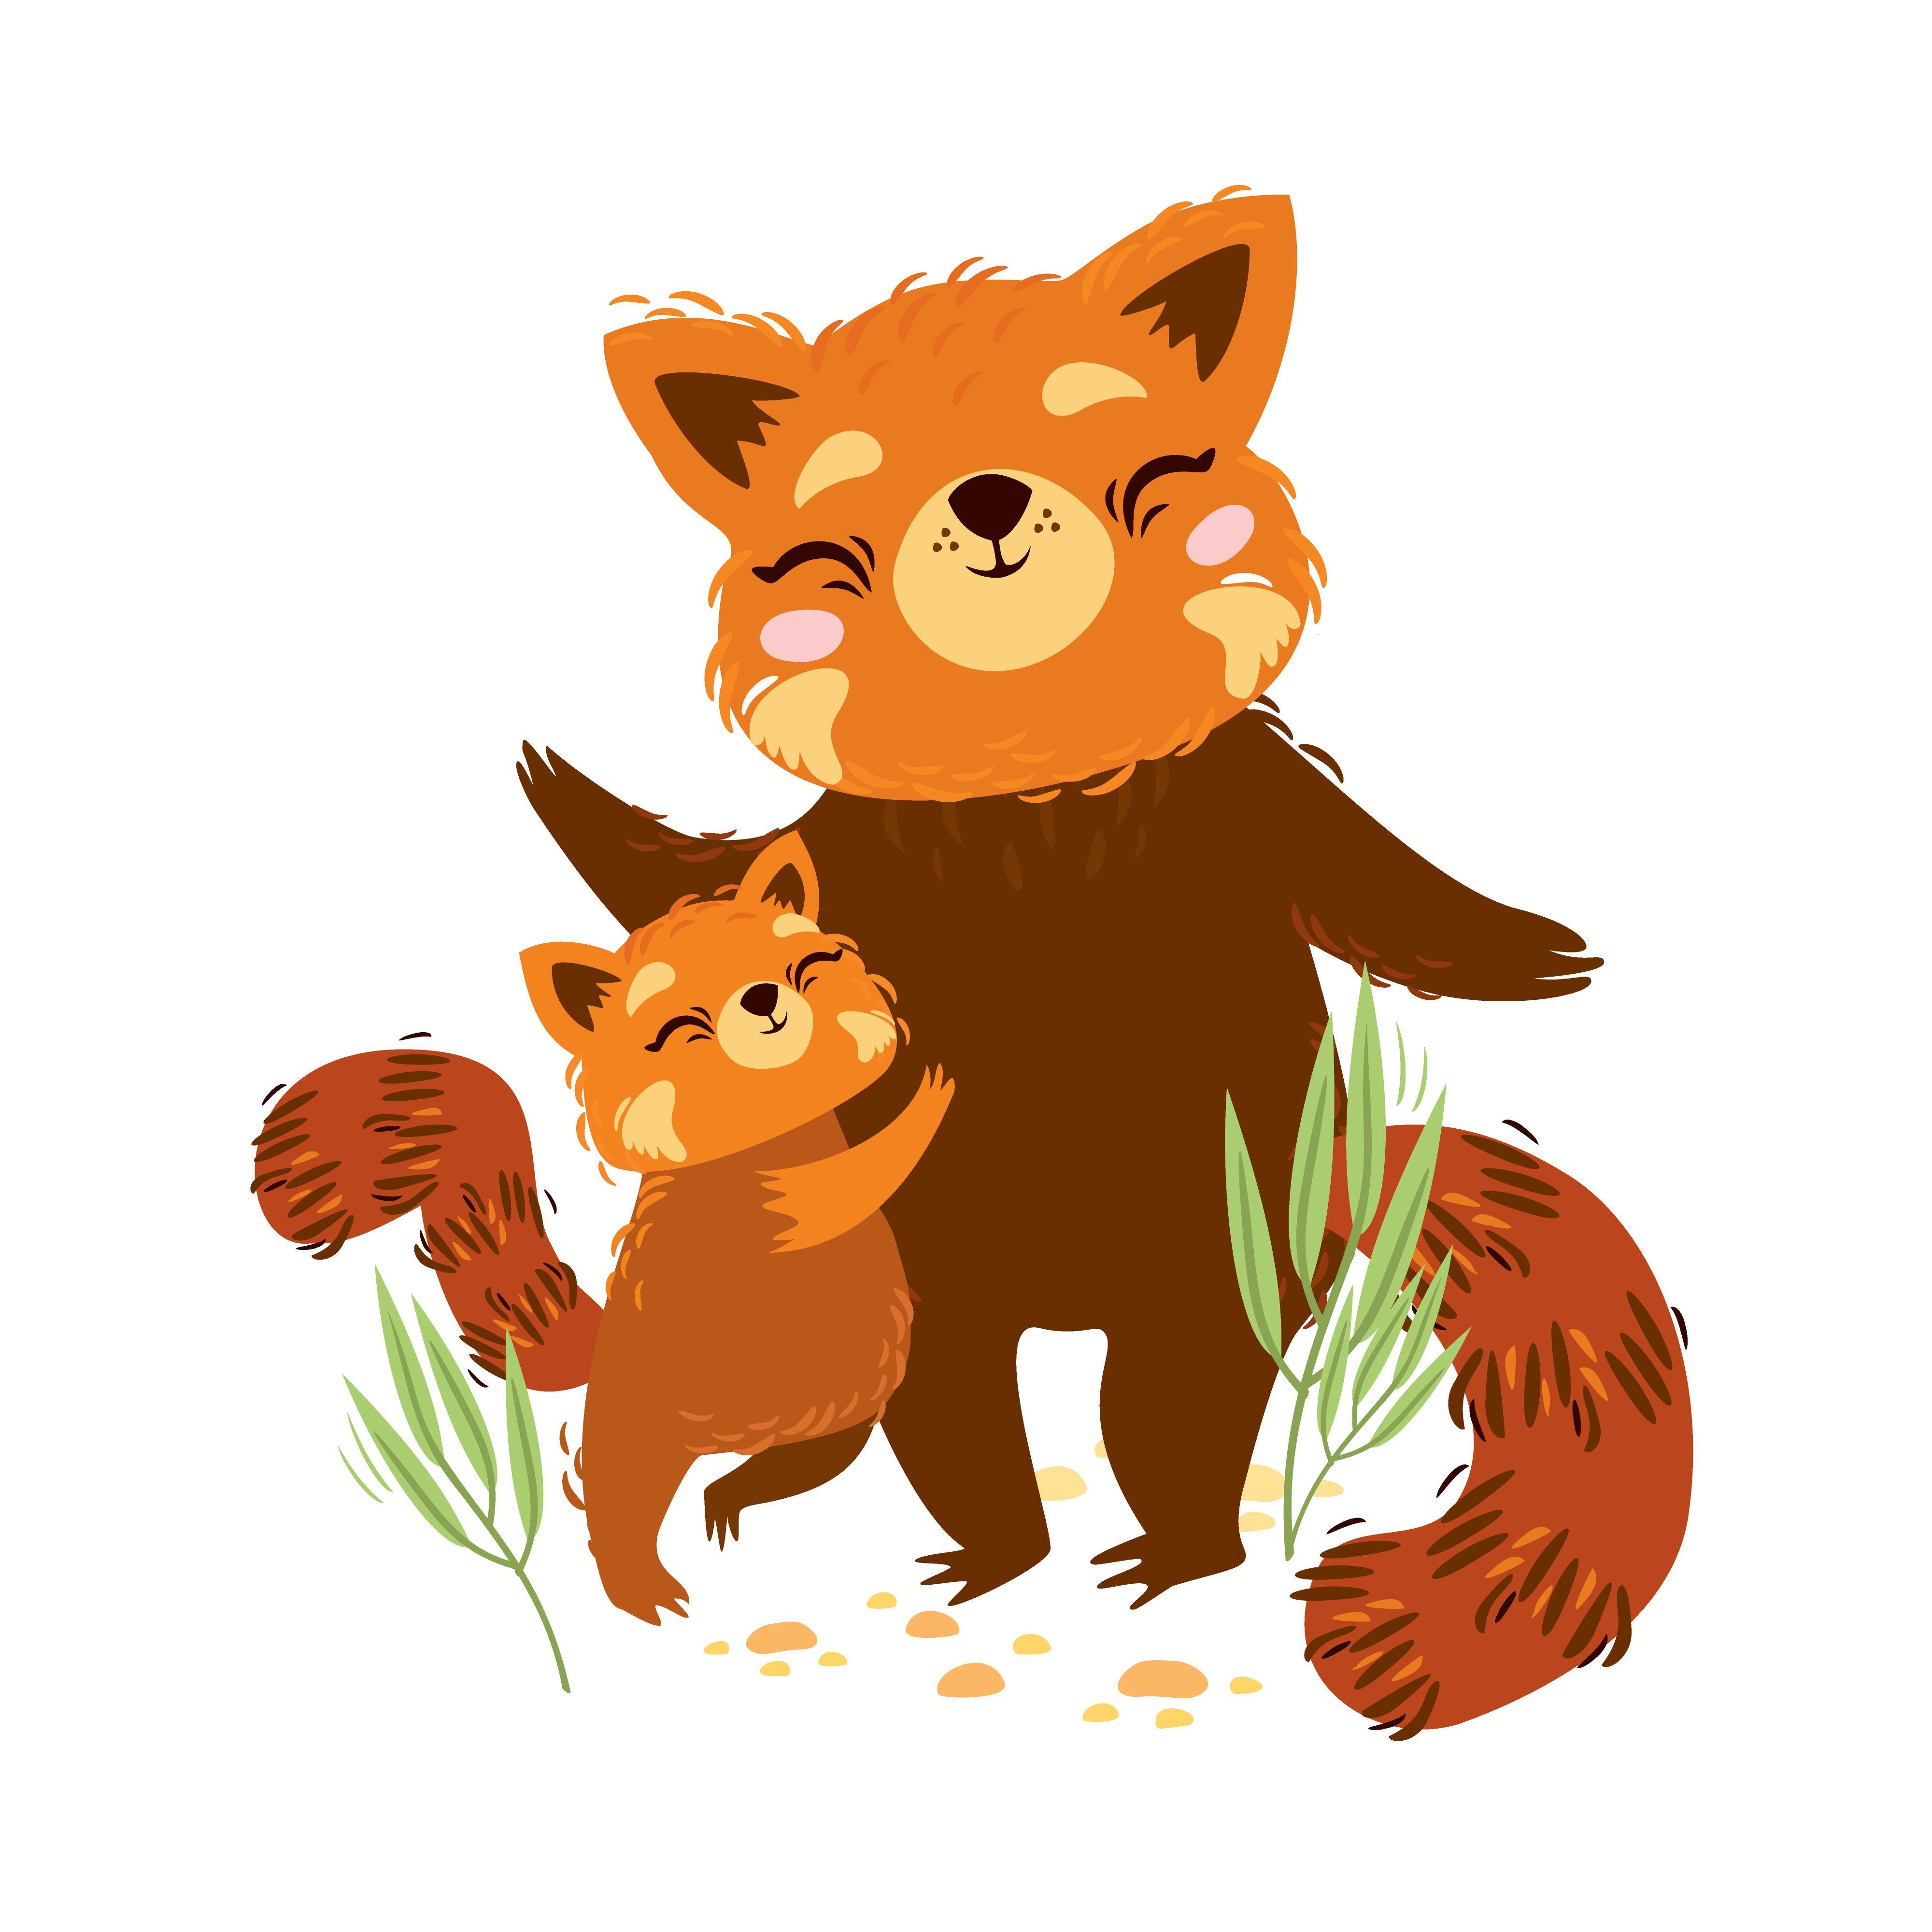 Baby Animals Mother Sute Family Hug Illustration Animal Illustration Red Panda